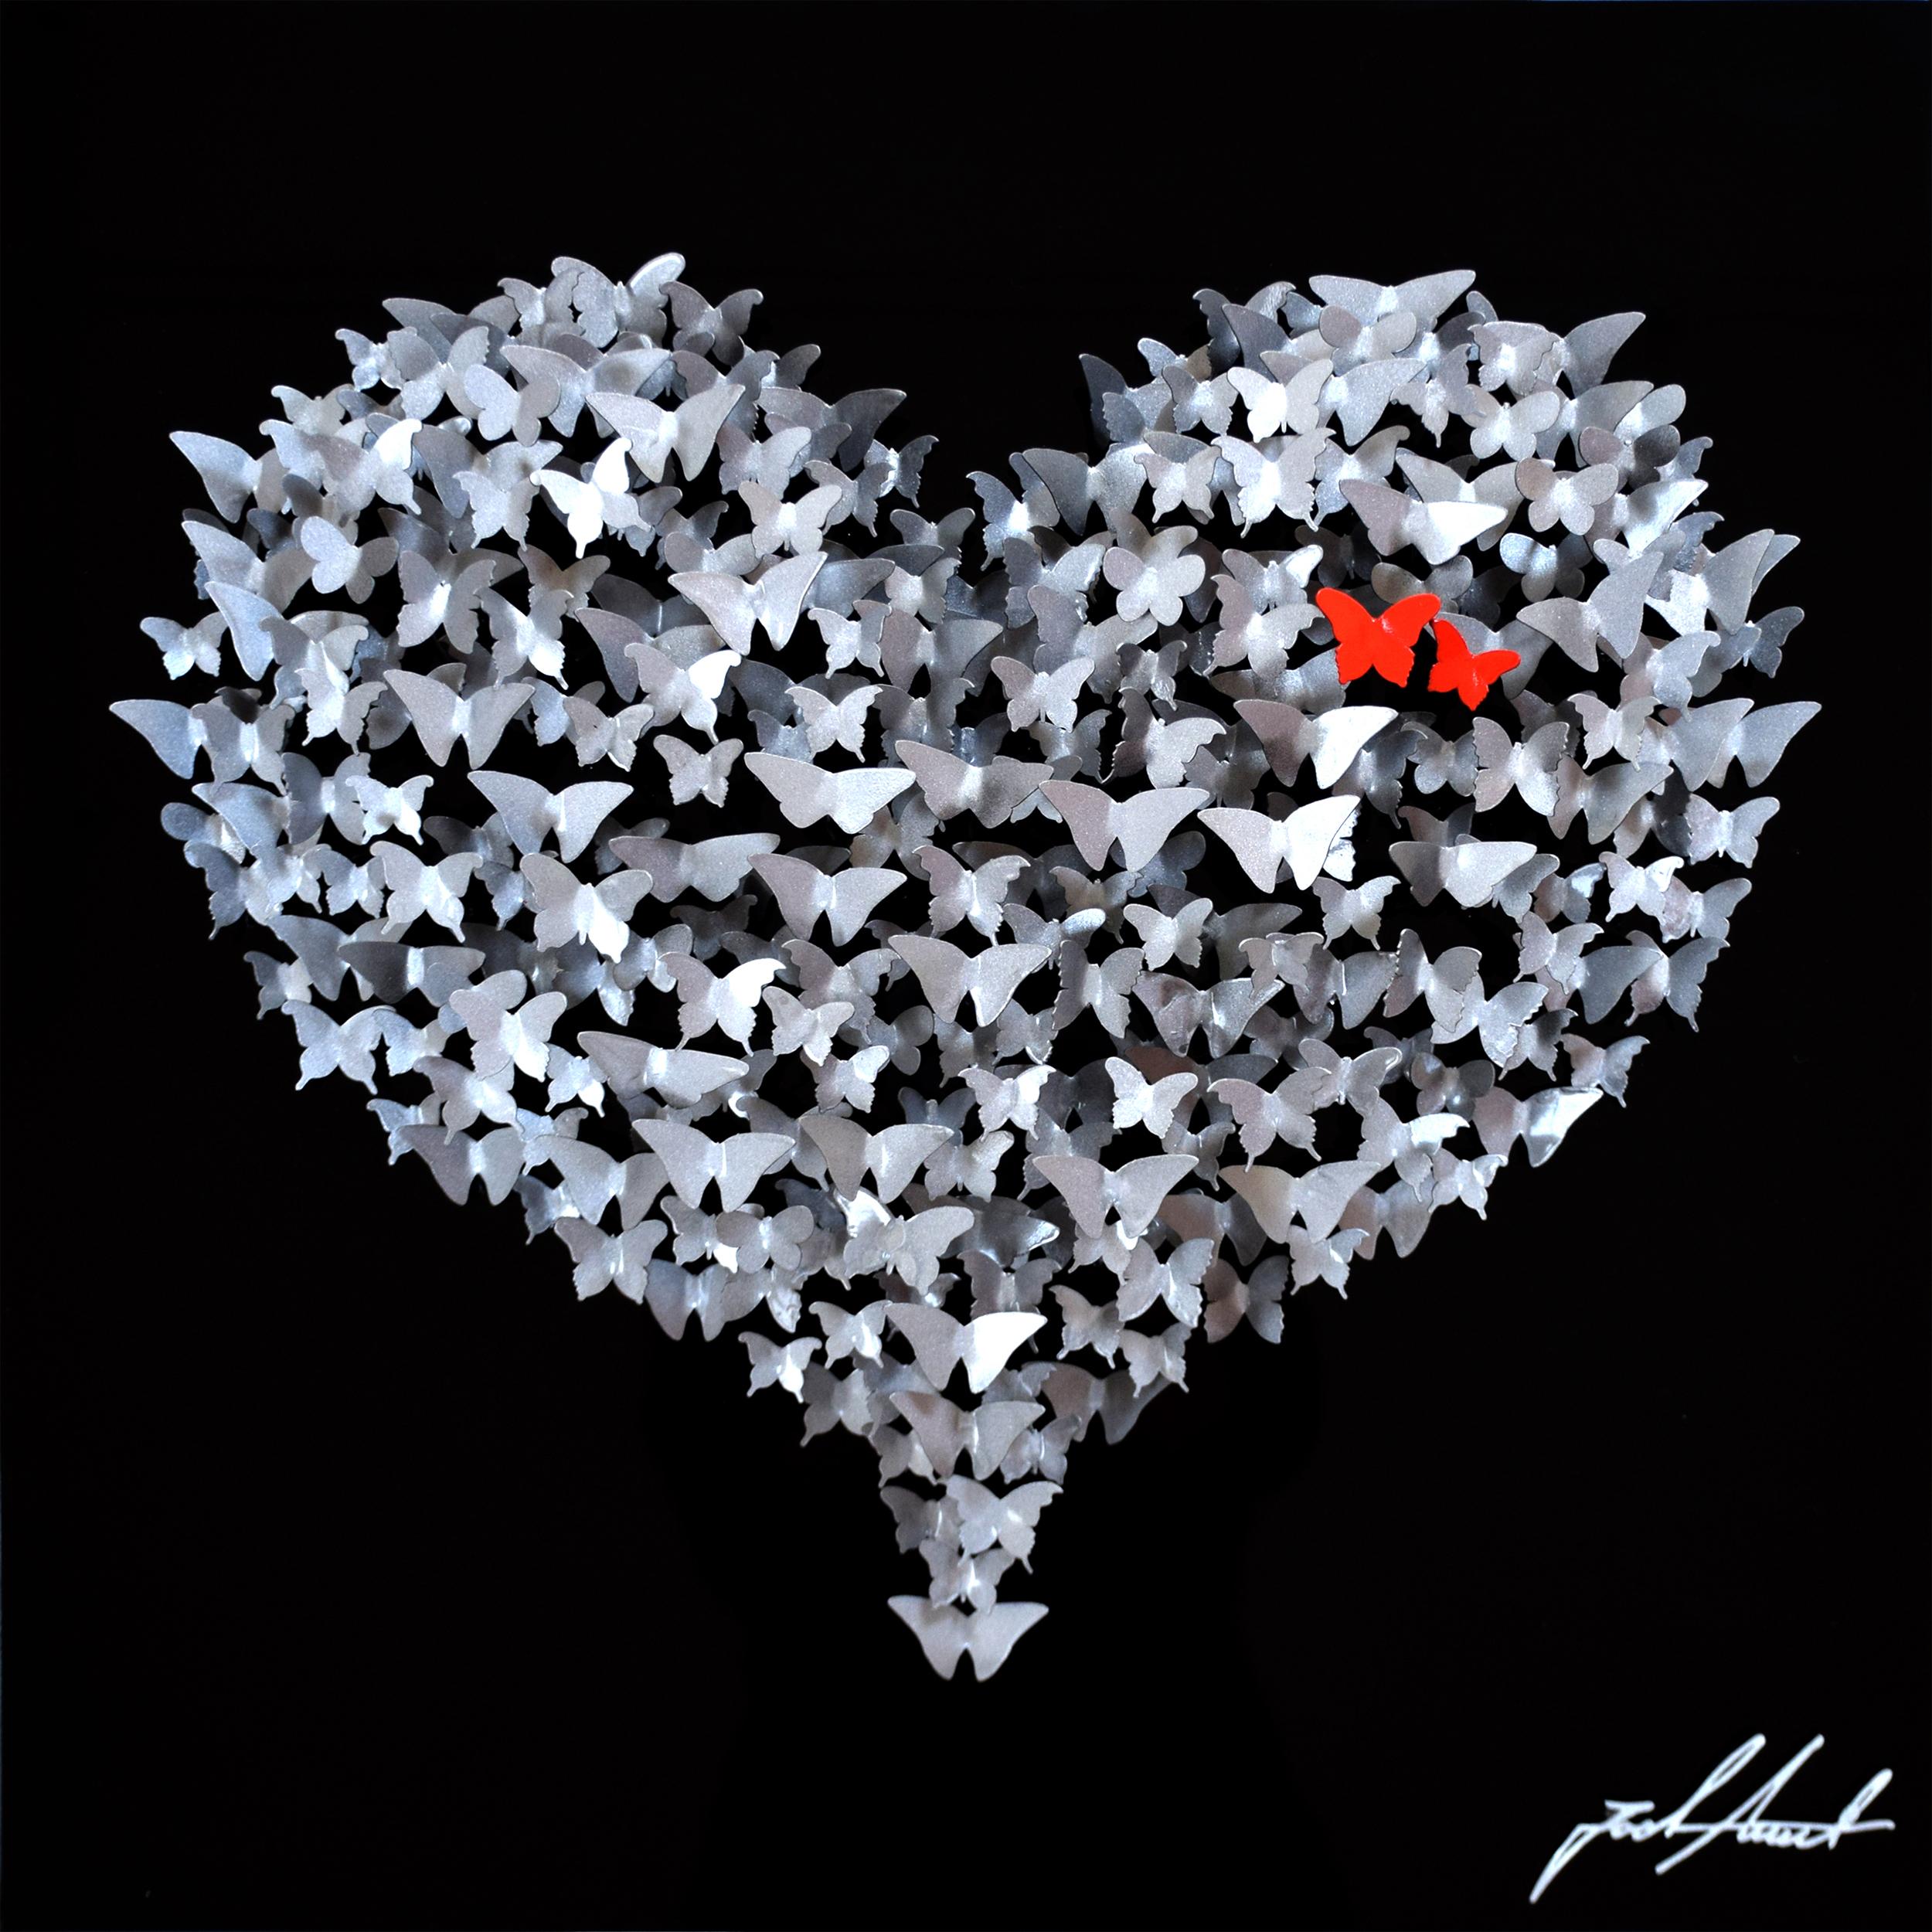 Joel Amit - Flying Love (Silver on Black) , 6665-012-098